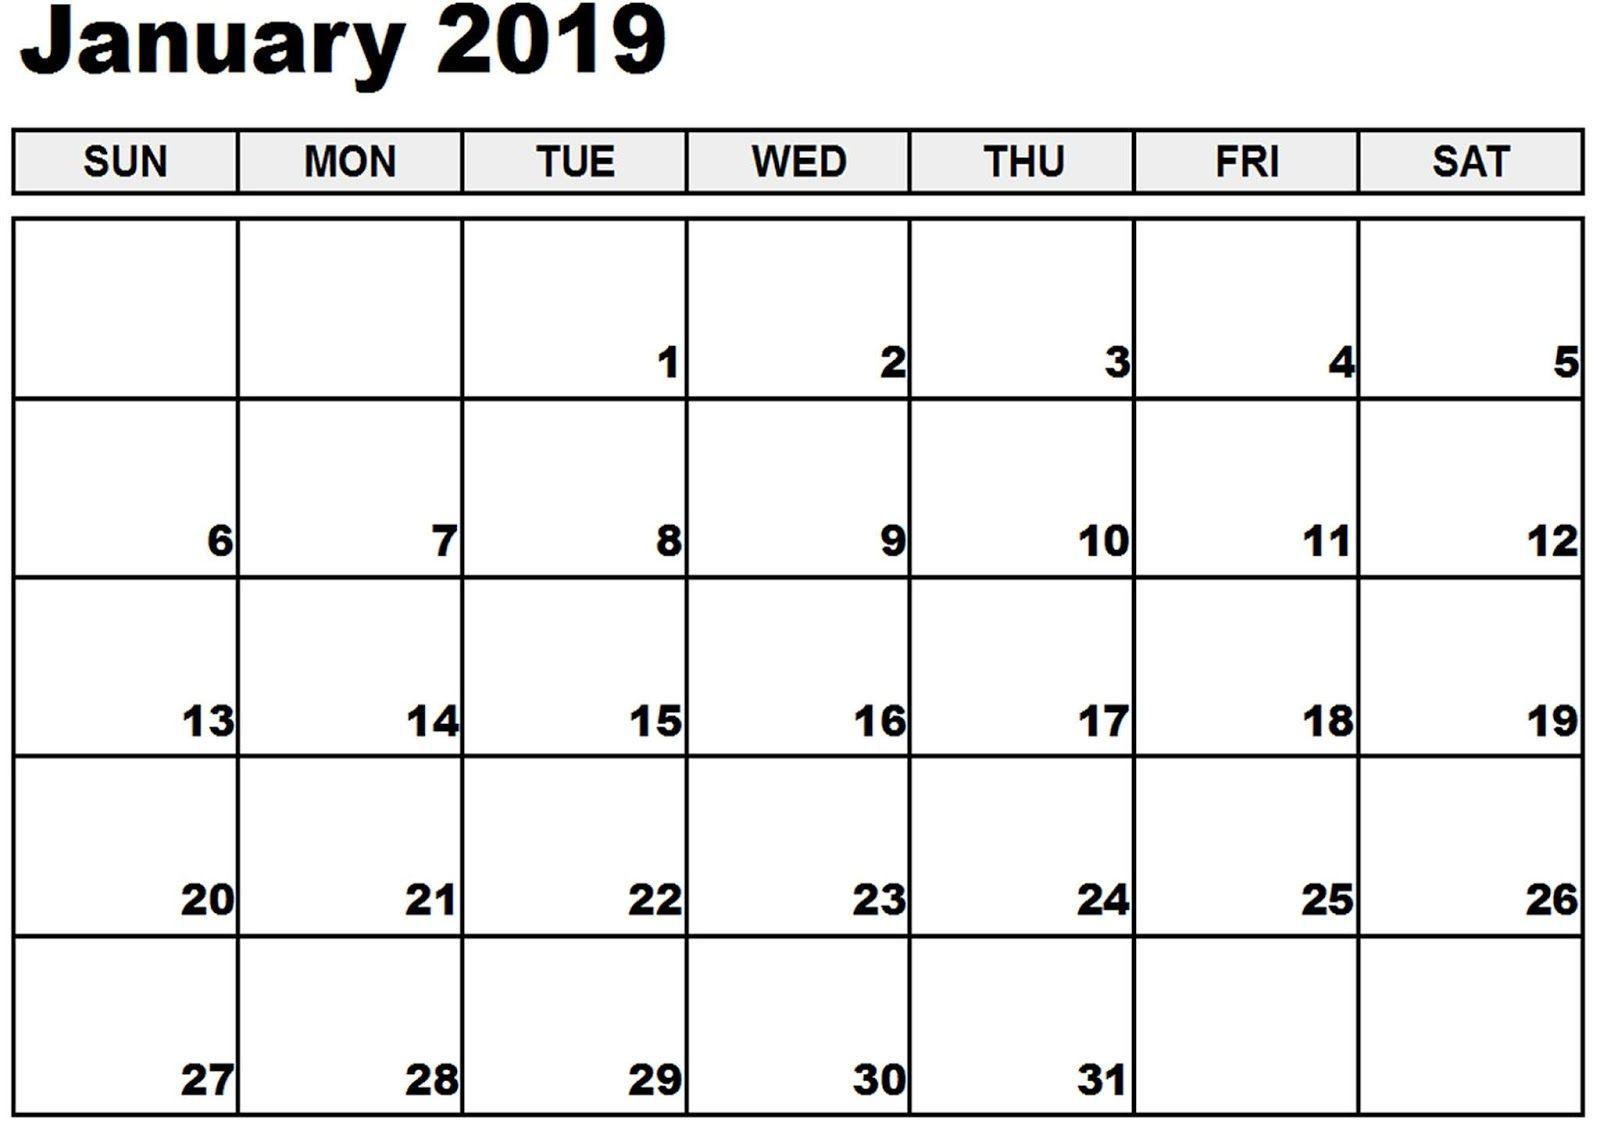 Calendar 2019 January Pdf January Calendar 2019 Word #january2019 #January